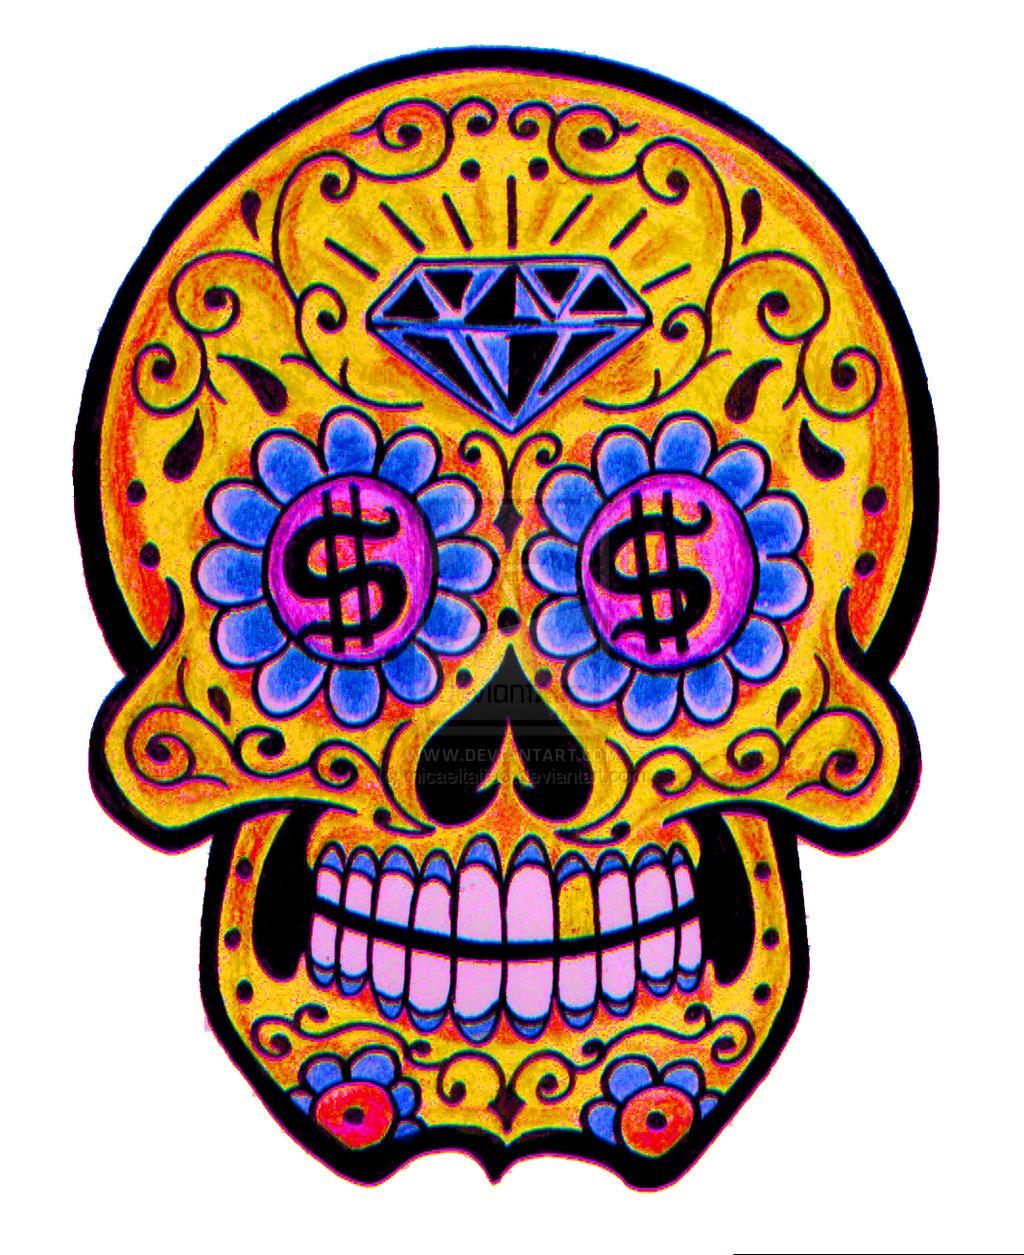 Skull tattoo designs simple tattoo designs skull clipart best - Sugar Skull By Micaeltattoo Designs Interfaces Tattoo